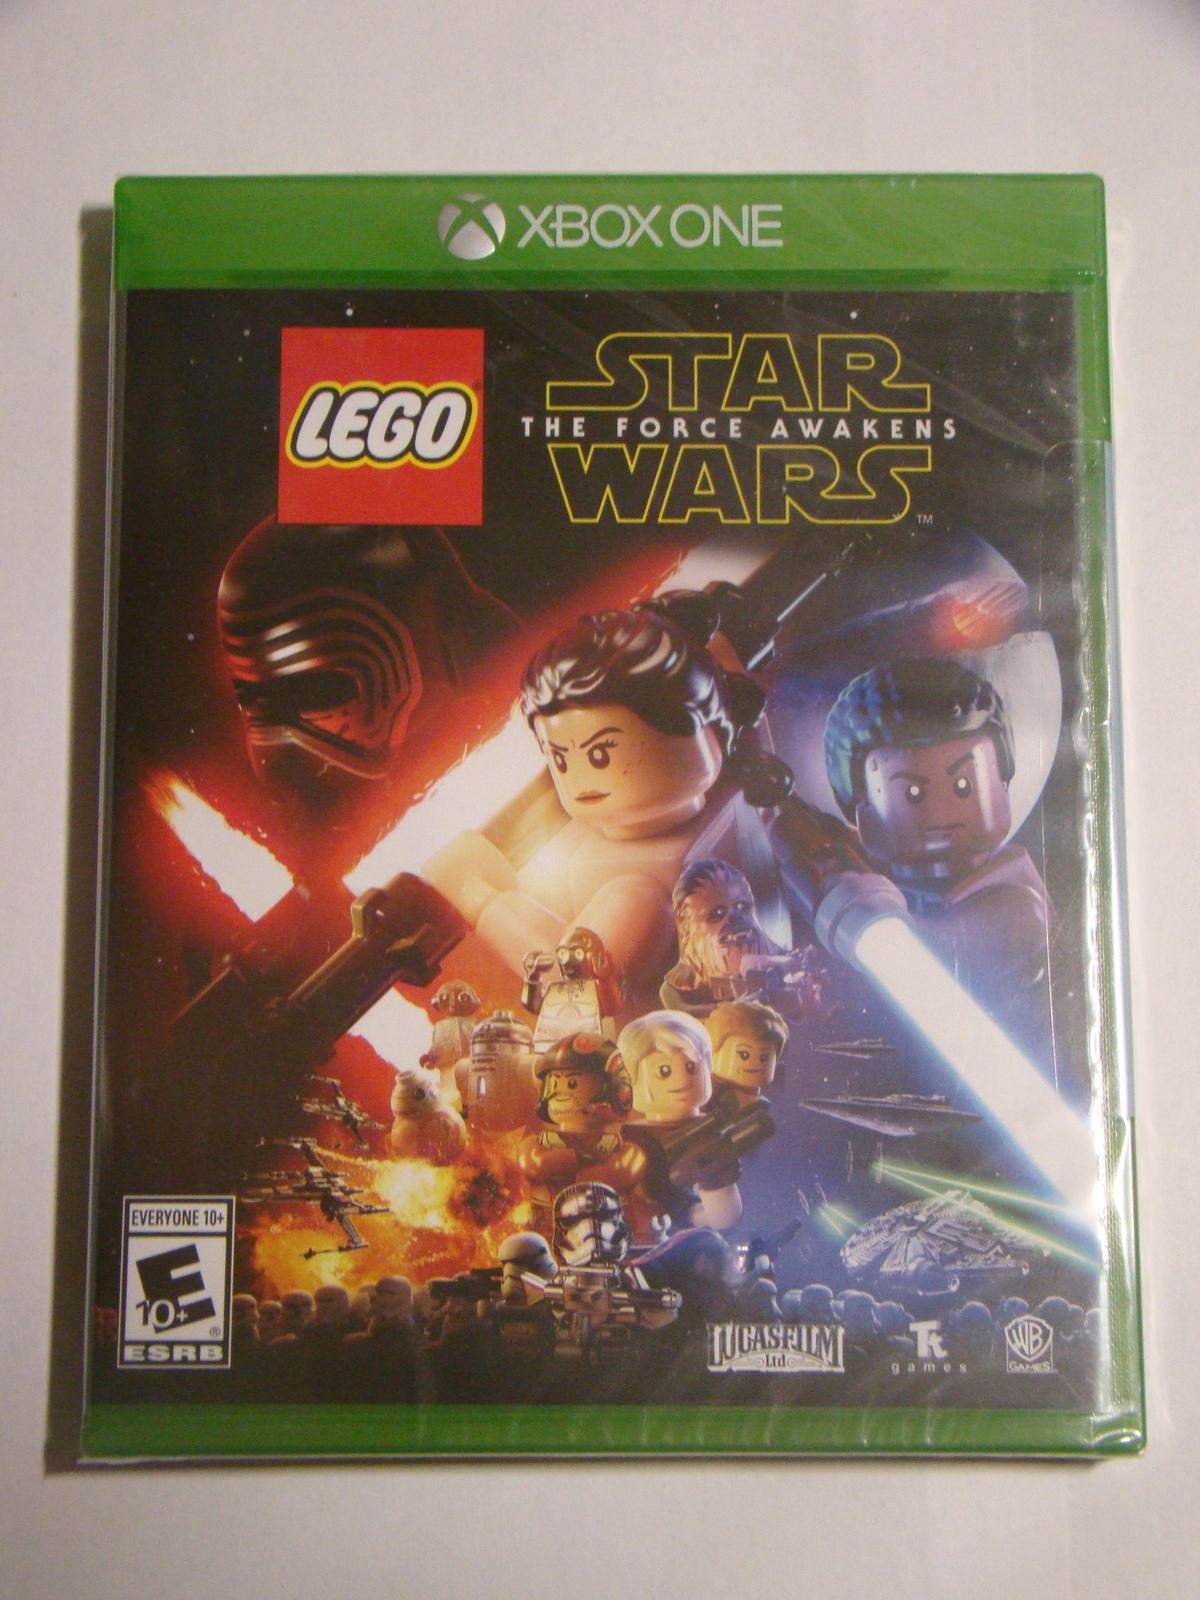 XBOX ONE - LEGO STAR WARS - THE FORCE AWAKENS (New)